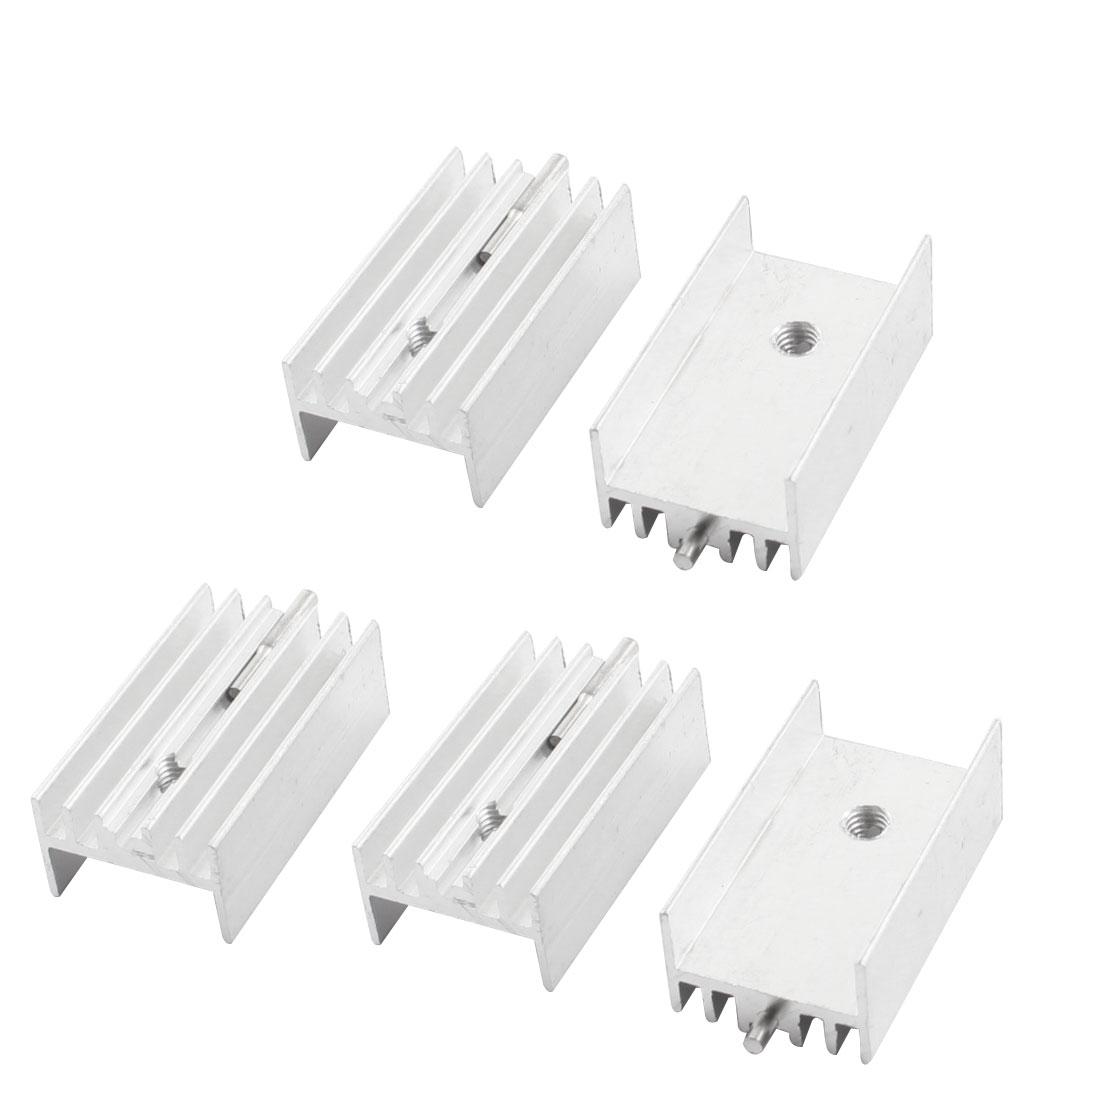 5Pcs 15mmx10mmx25mm Aluminium Radiator Fin Cooling Cooler Heatsink Heat Sink w Needle for PCB Board